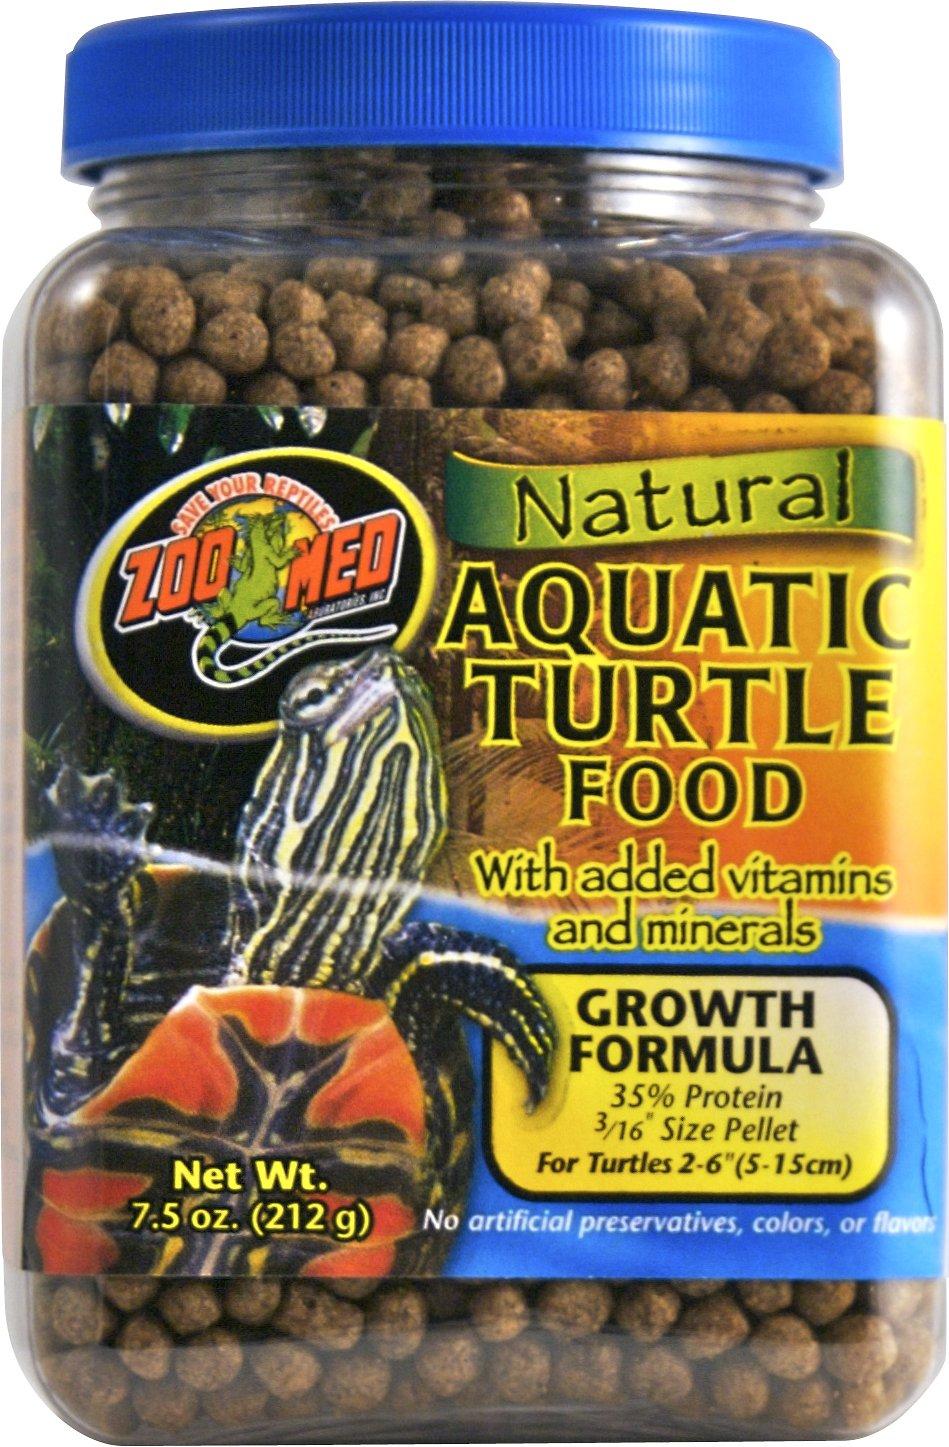 Zoo Med Natural Aquatic Turtle Food, 7.5-oz jar